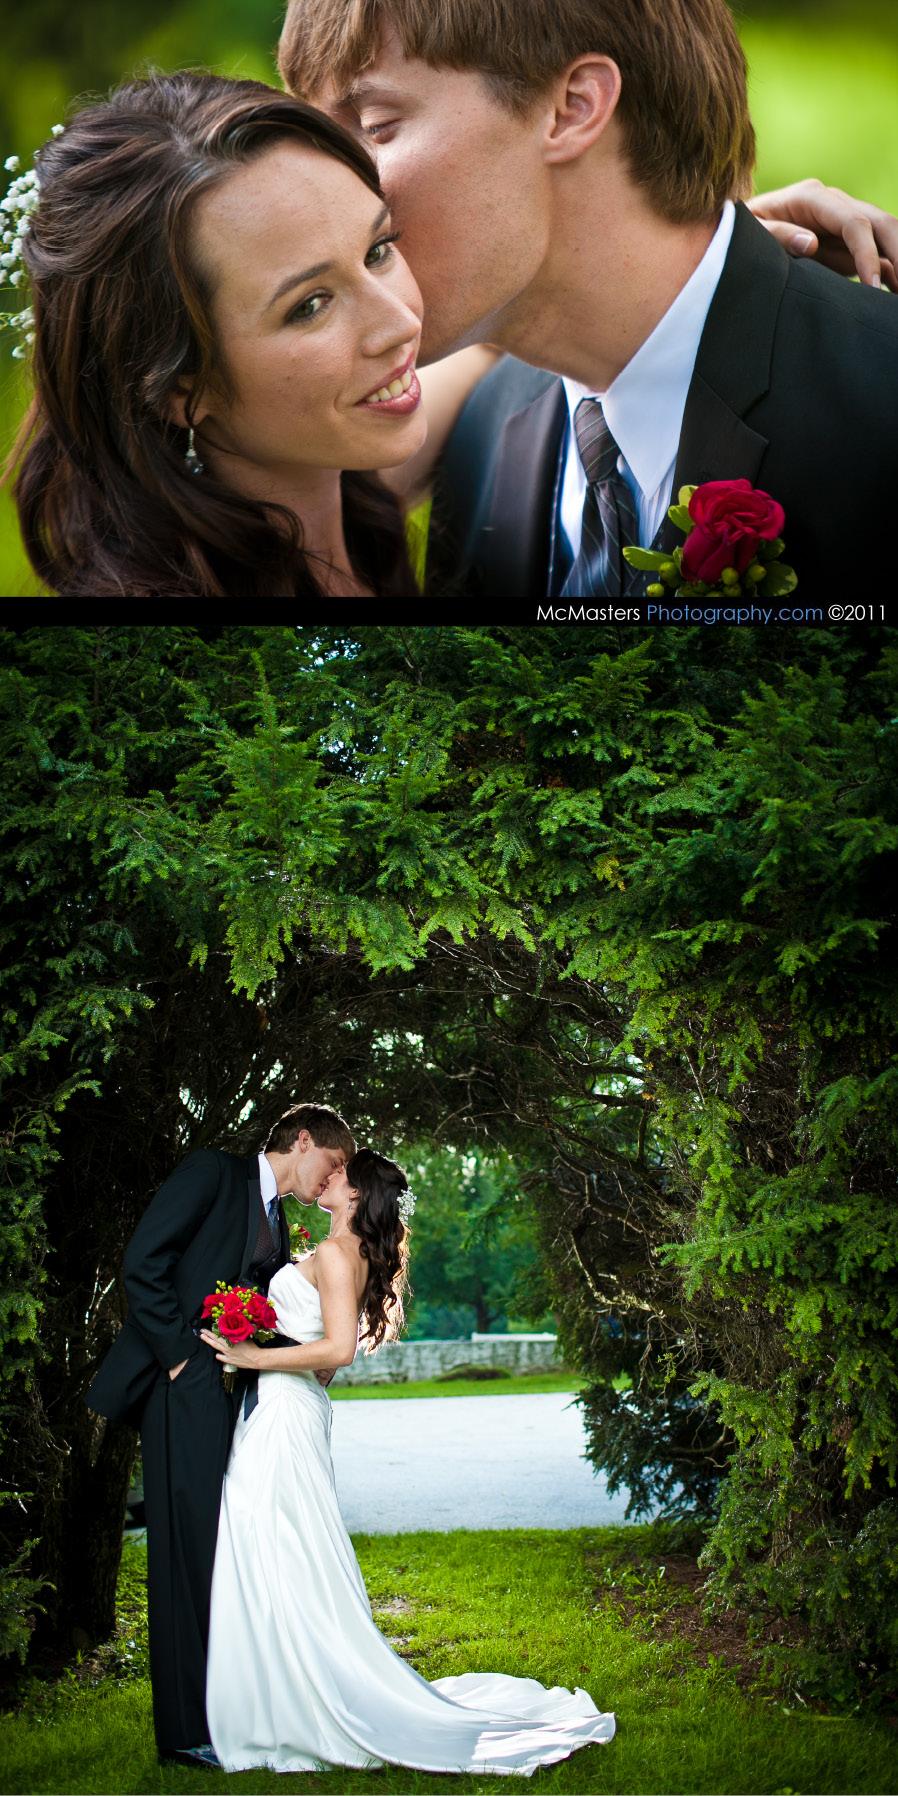 Hilltop House Wedding photos Devon PA